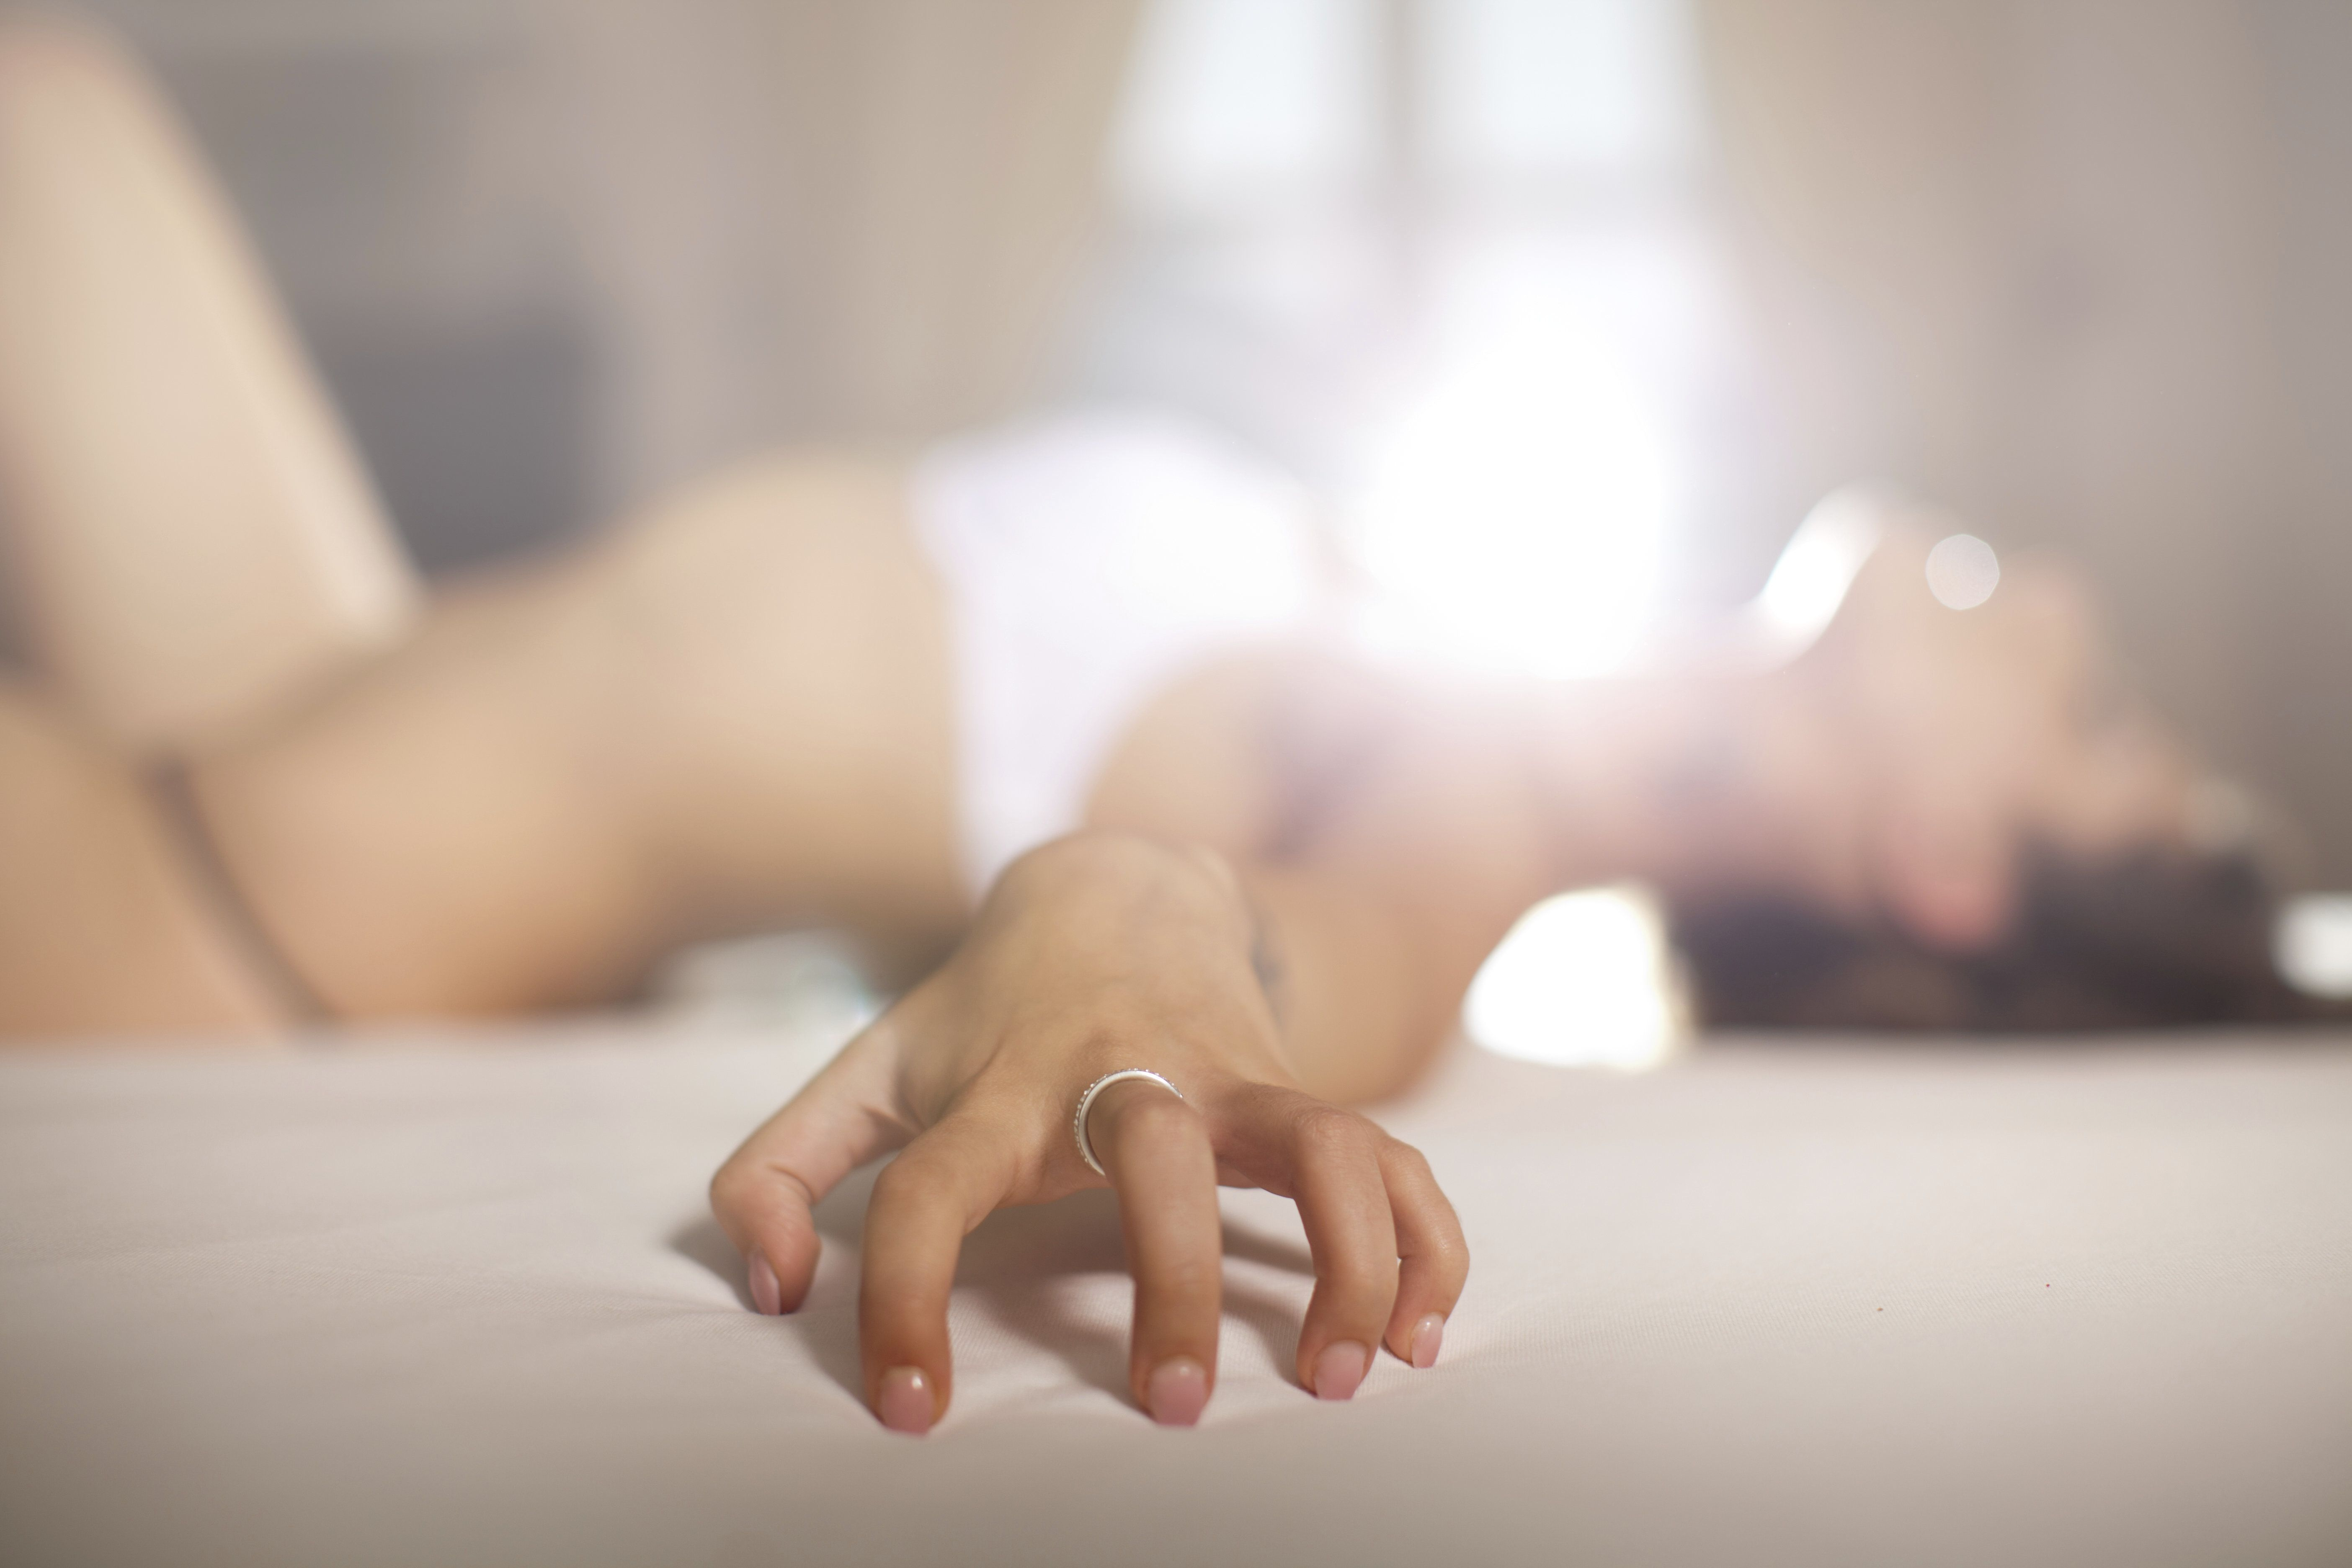 Sexual pleasure for women